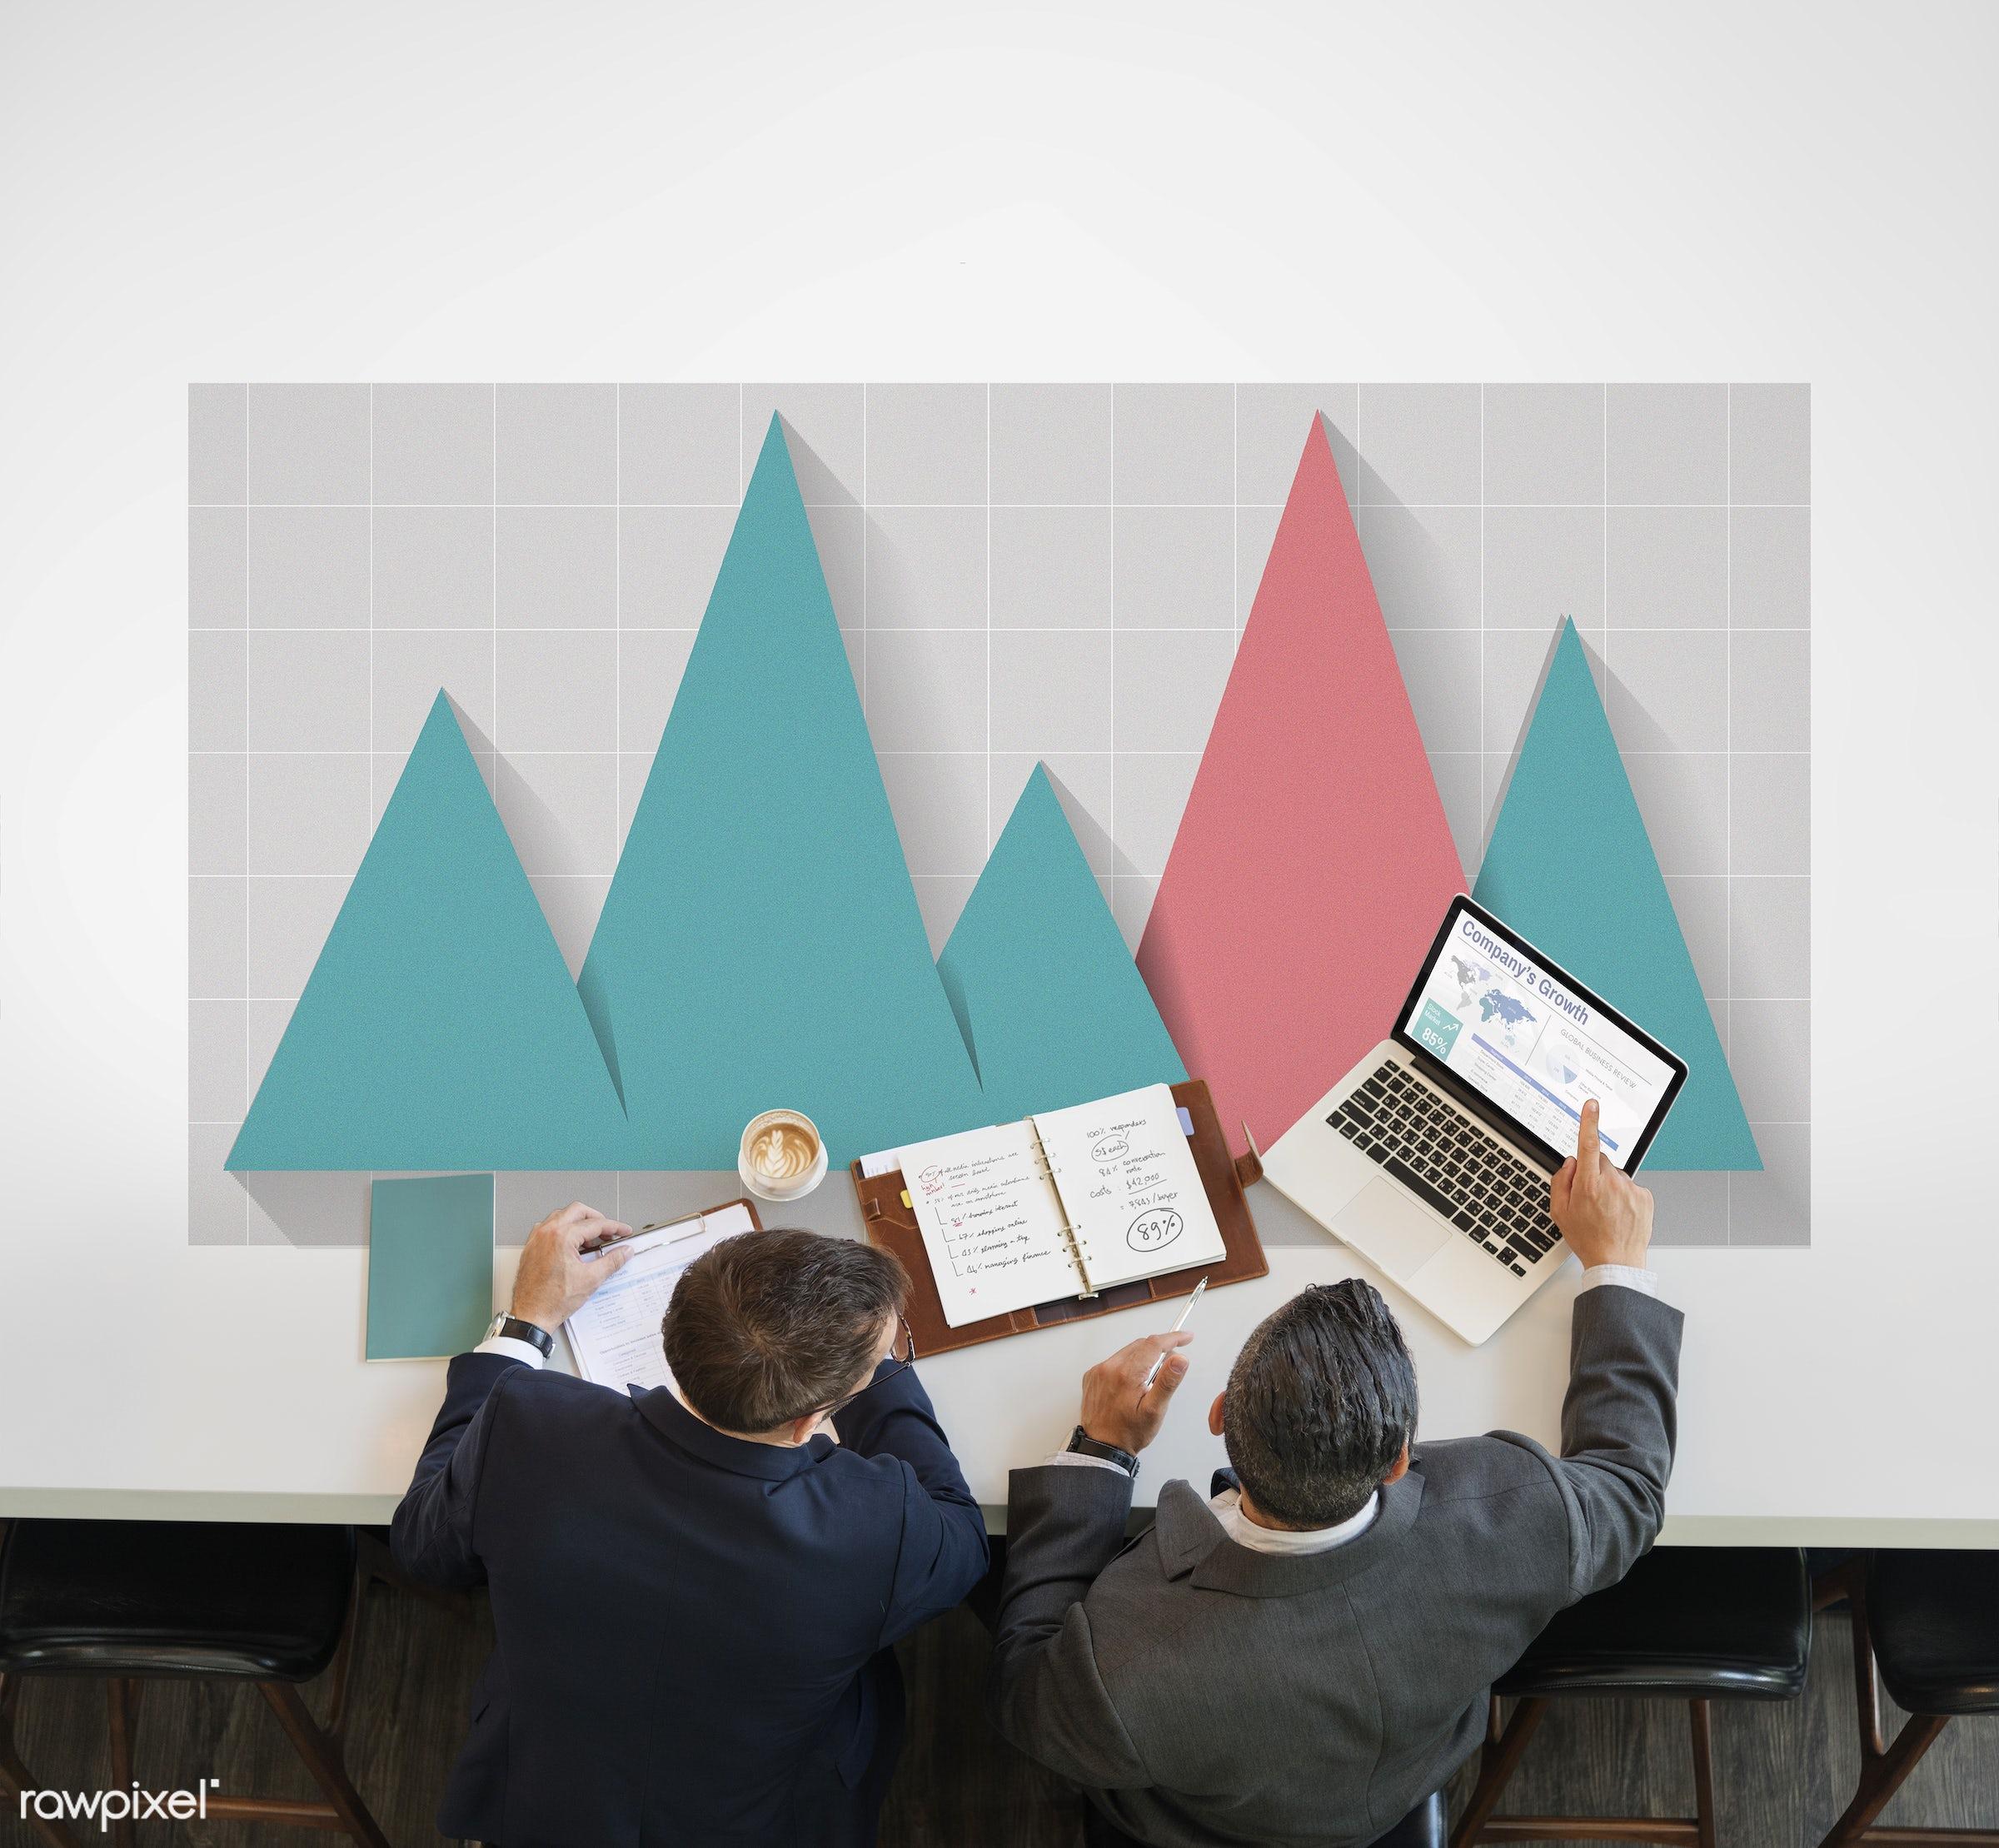 Business statistics - analysis, business, businessman, businessmen, businessperson, chart, daily report, data, data analysis...